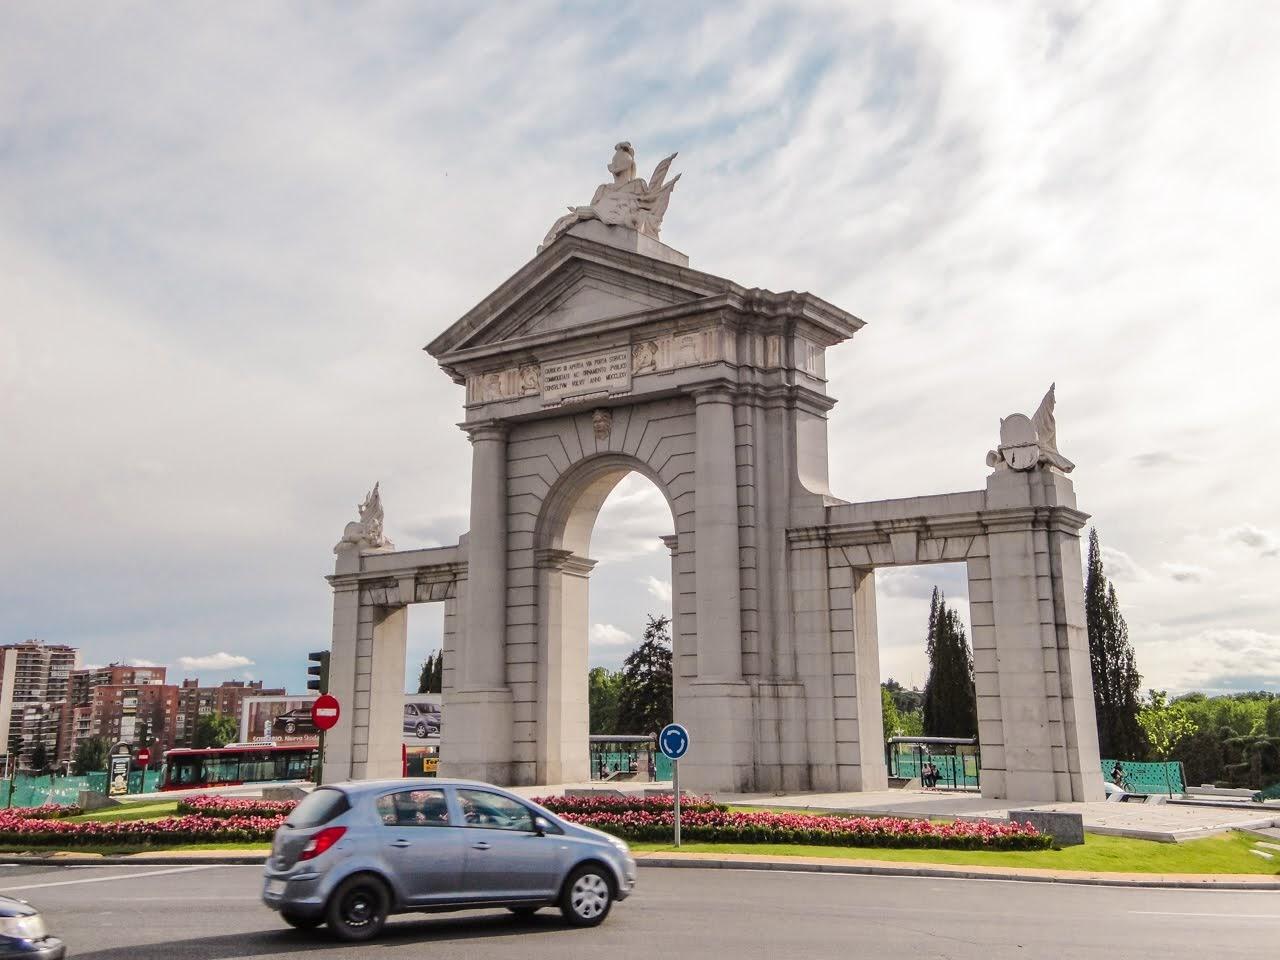 La Puerta de San Vicente in the late afternoon